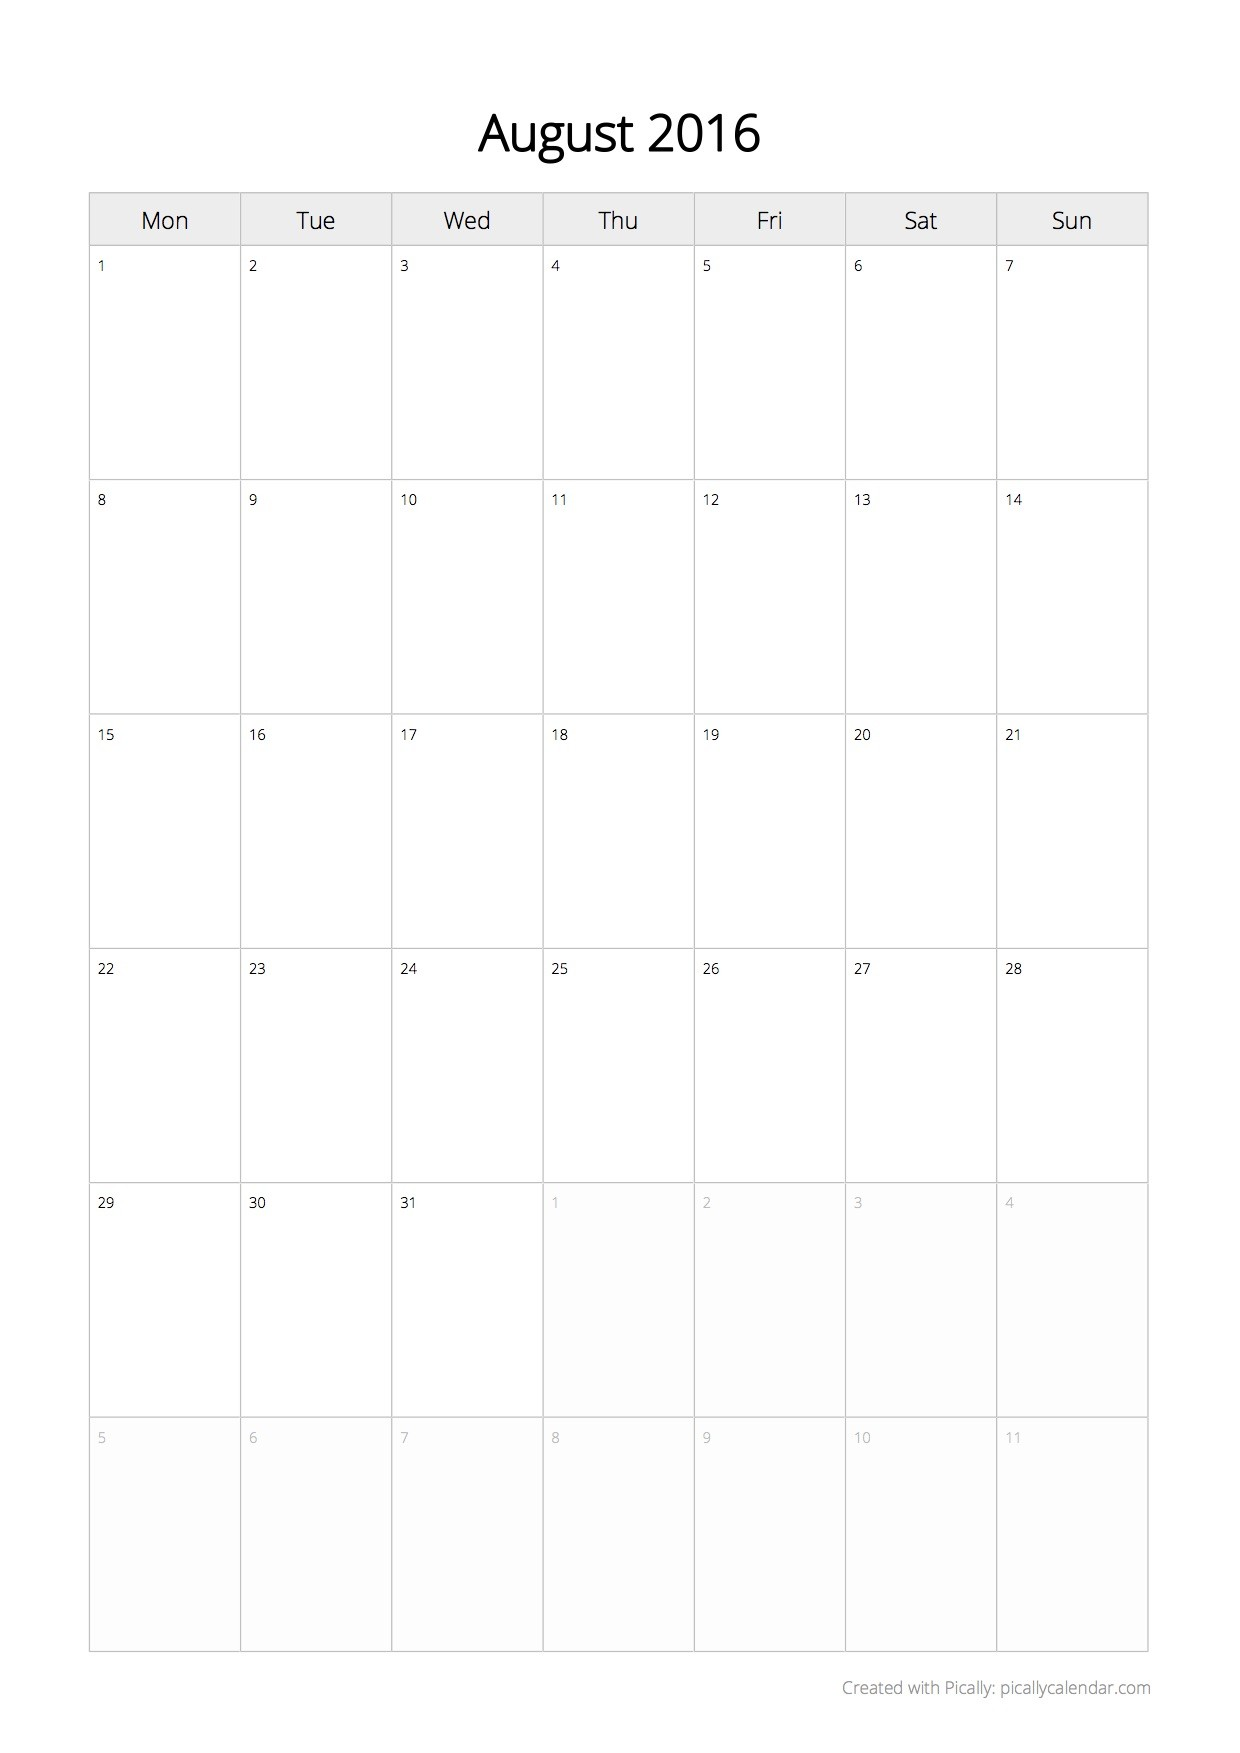 Plain Calendar Printable Create Free Calendar 2019 and 2020 Picallycalendar